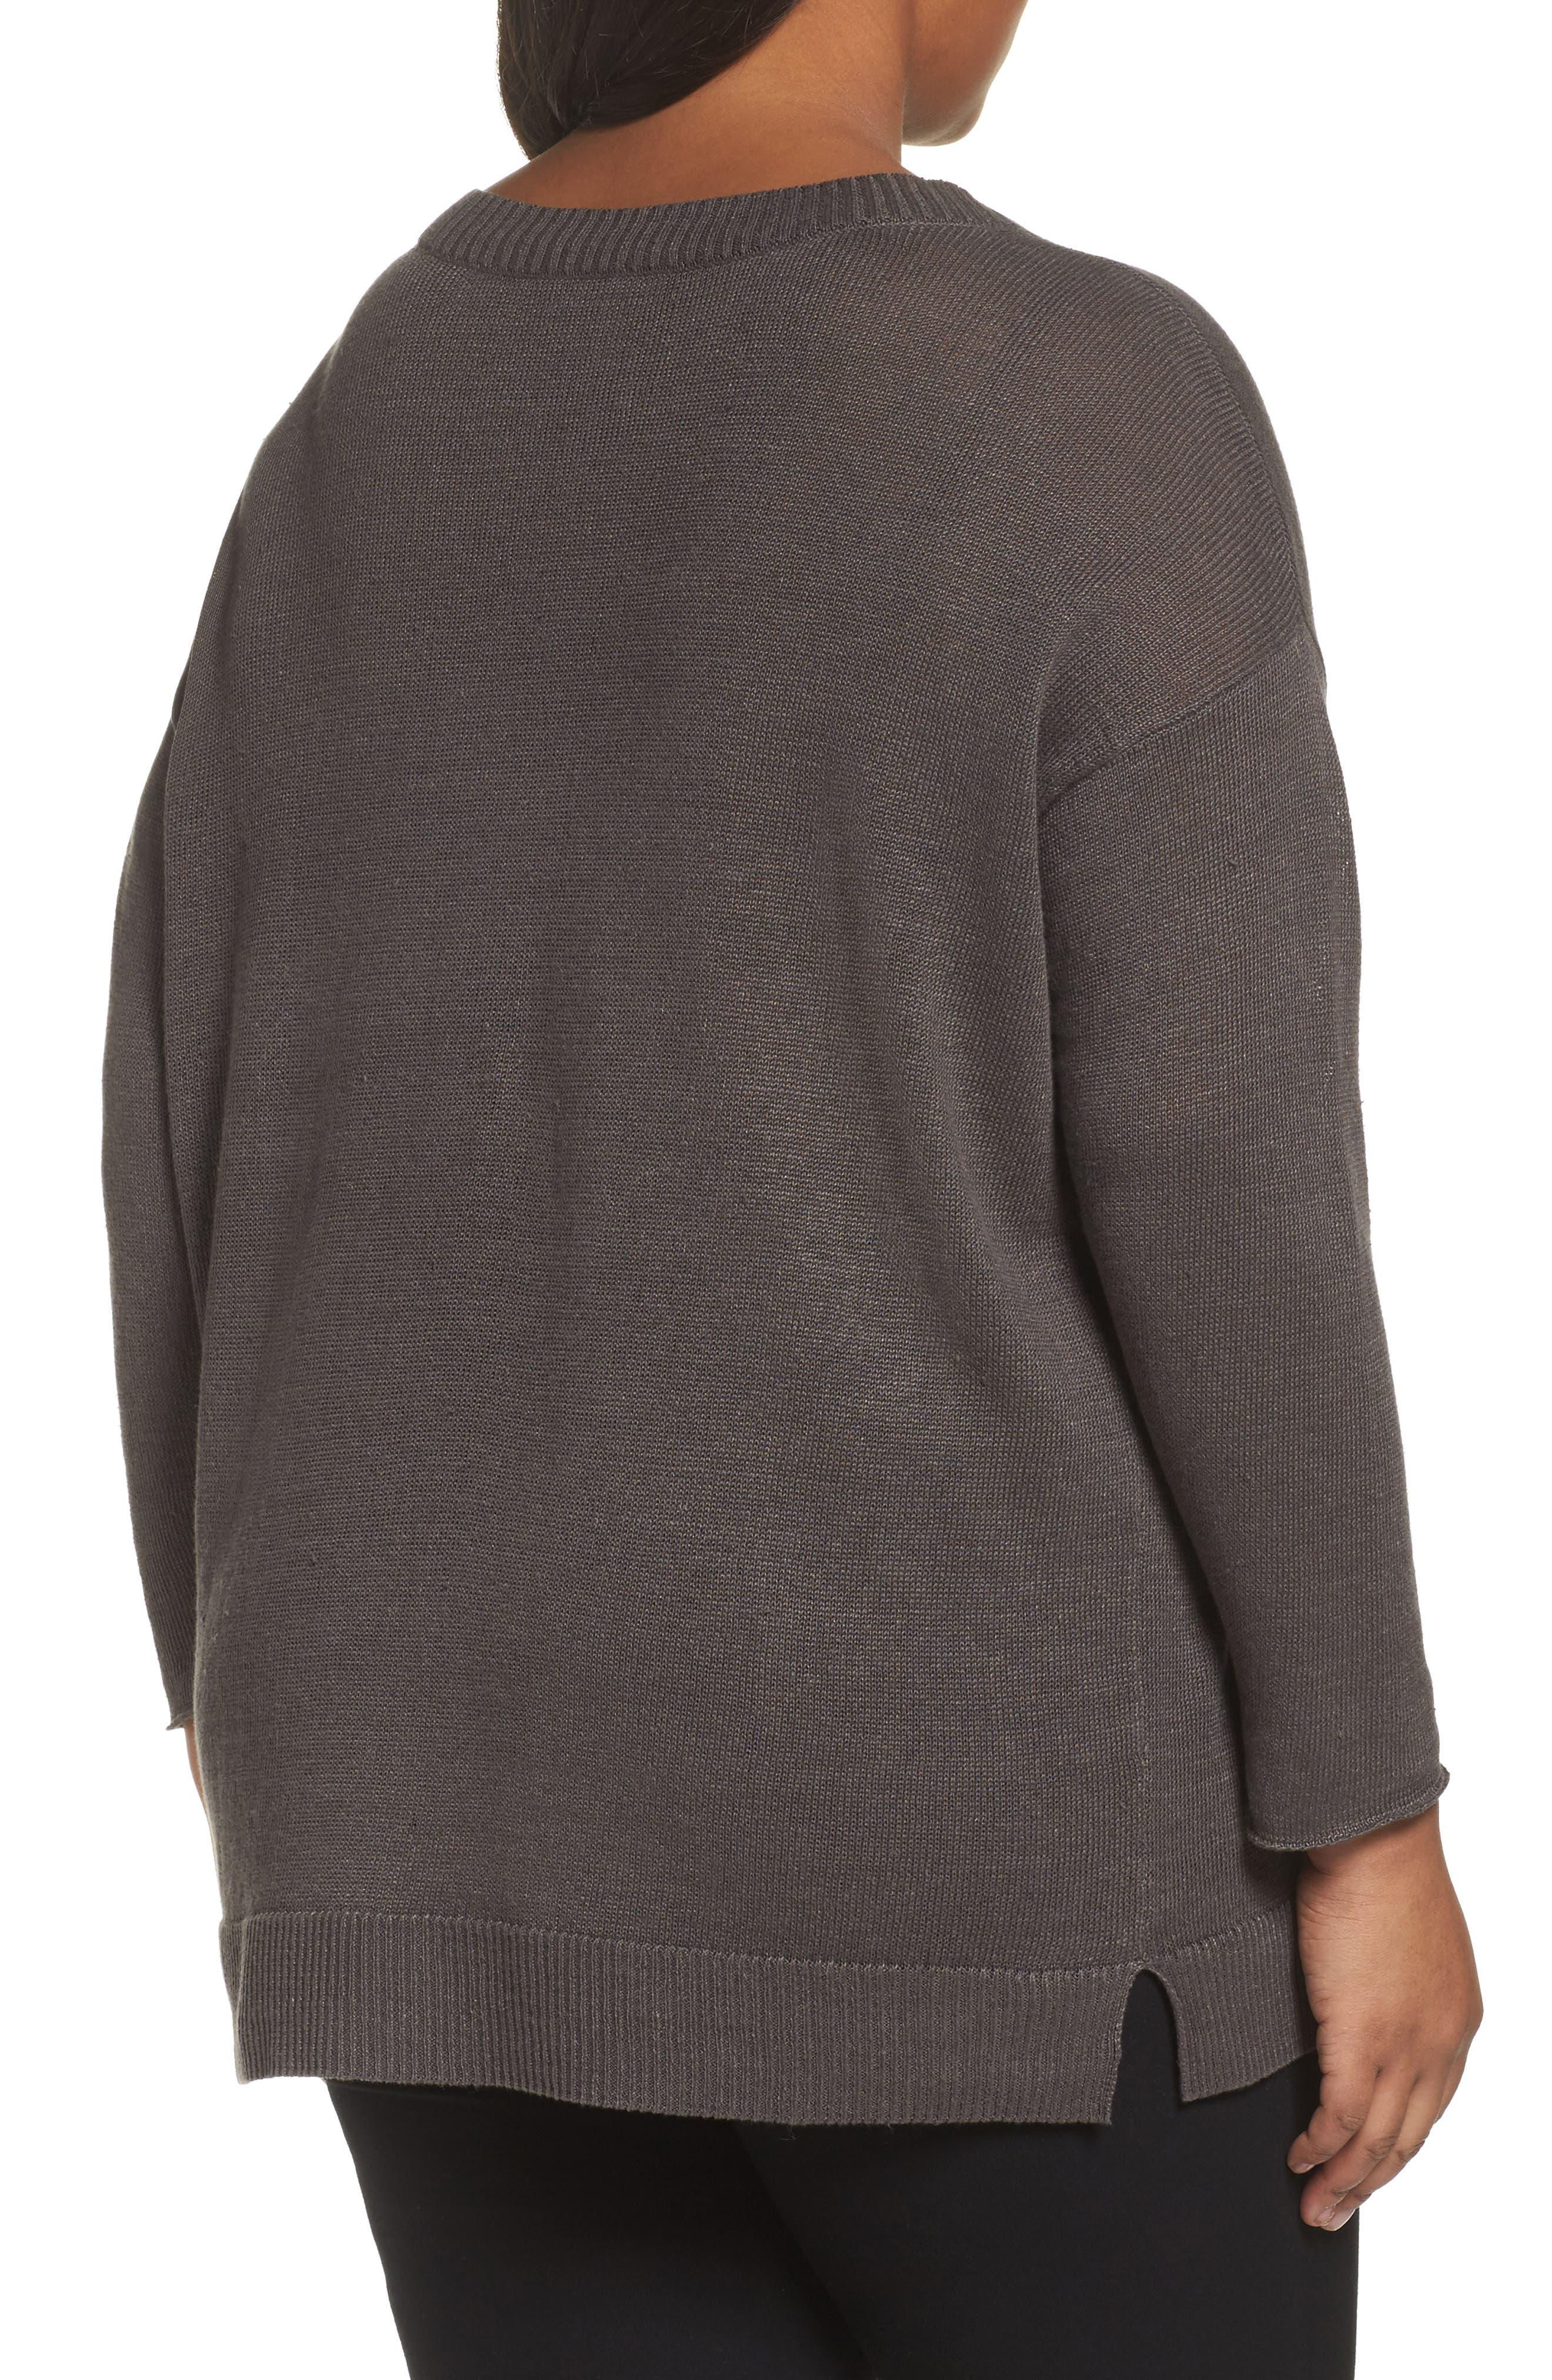 Organic Linen Sweater,                             Alternate thumbnail 2, color,                             245